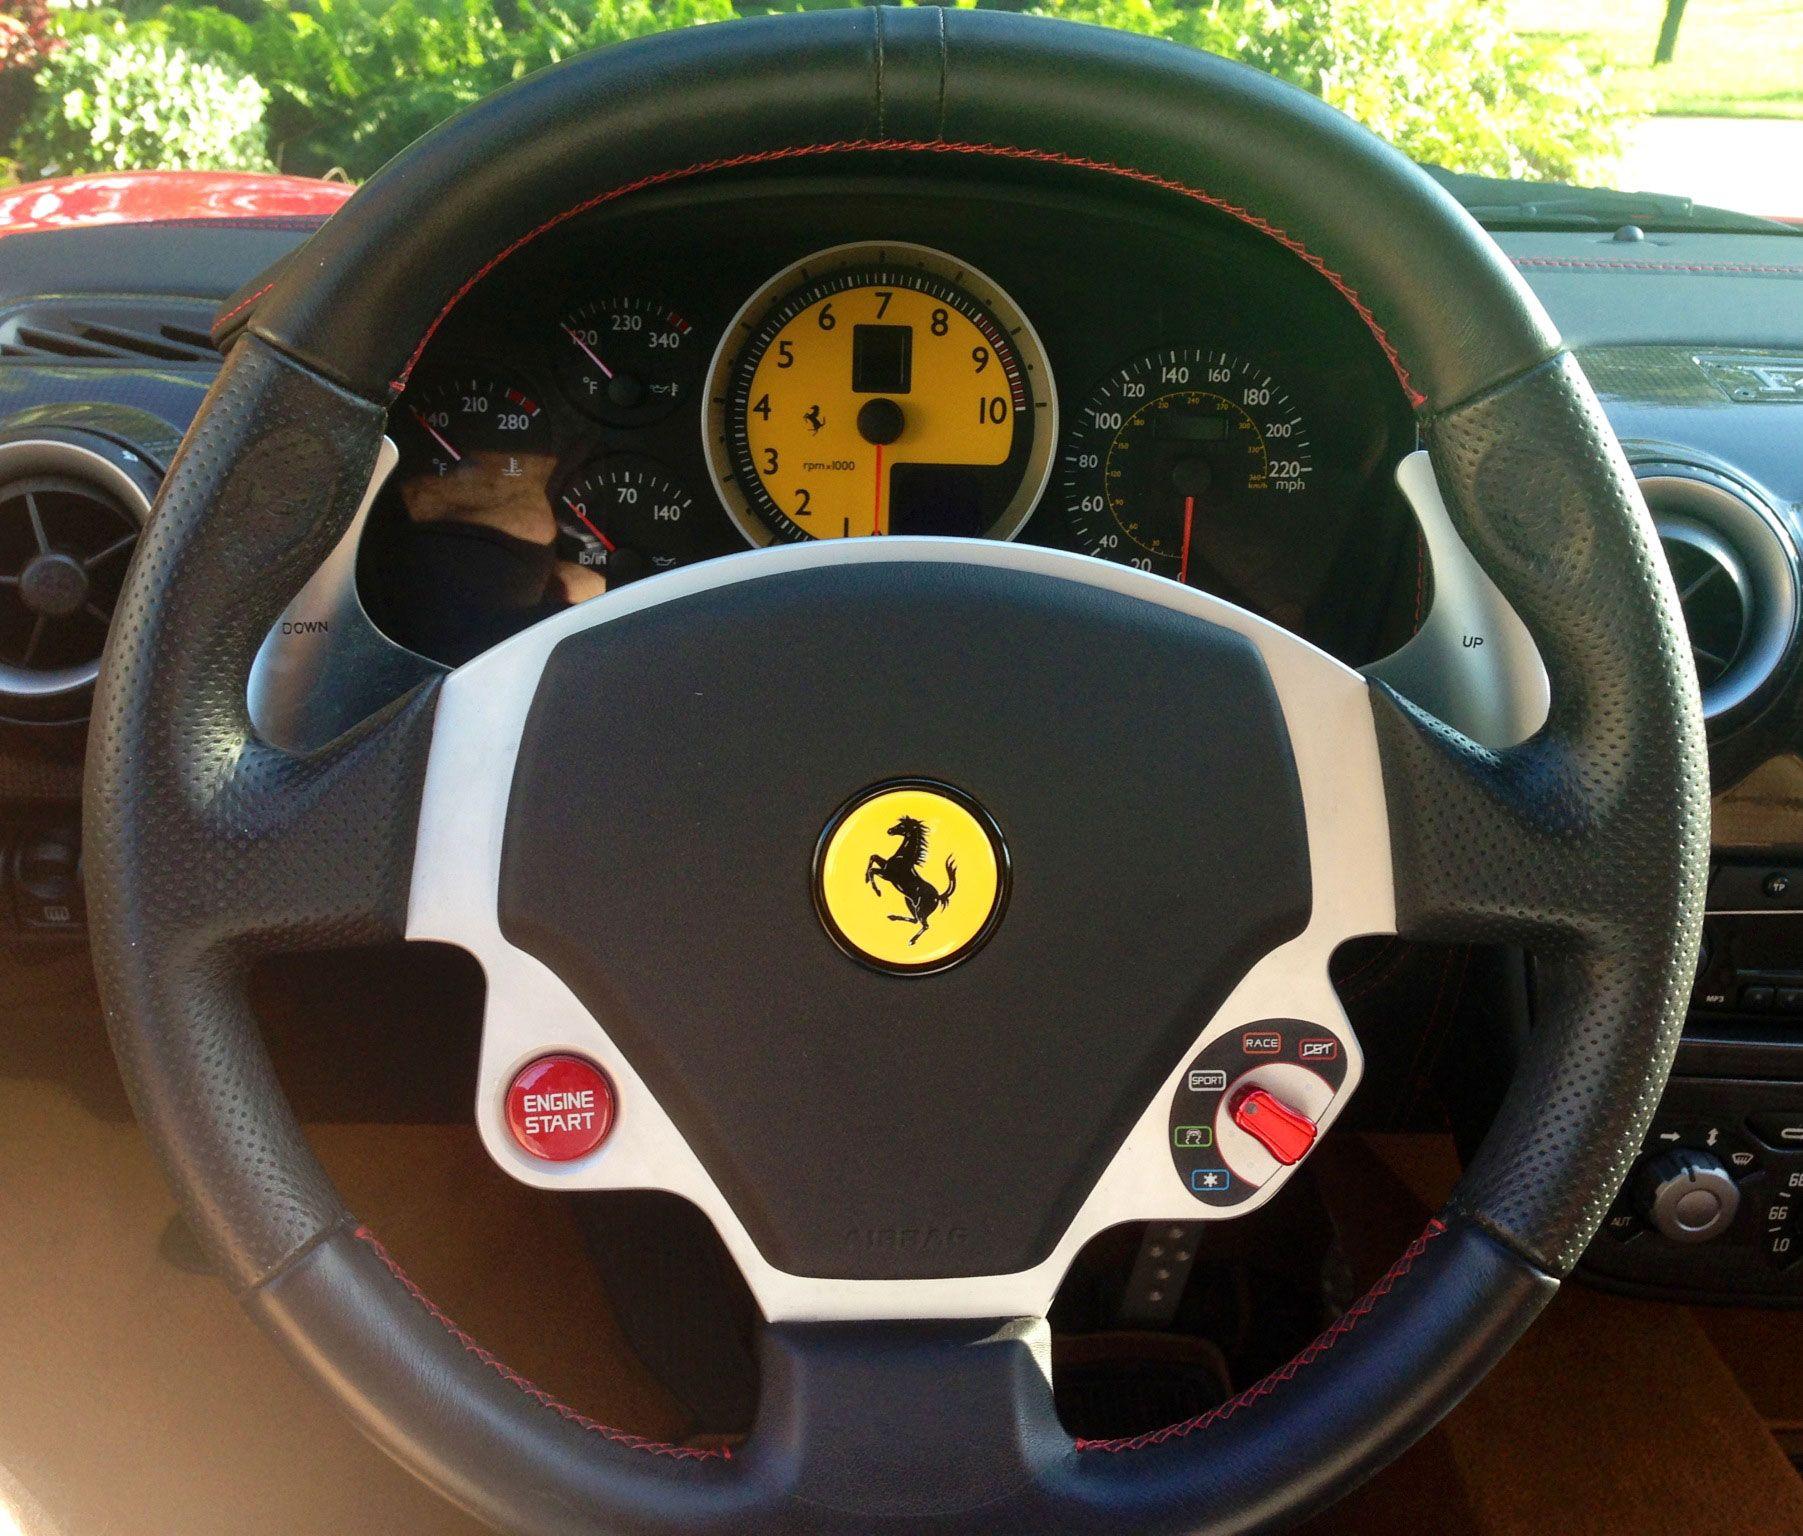 2006 Ferrari F430 Interior: 2007 Ferrari F430 F1 Steering